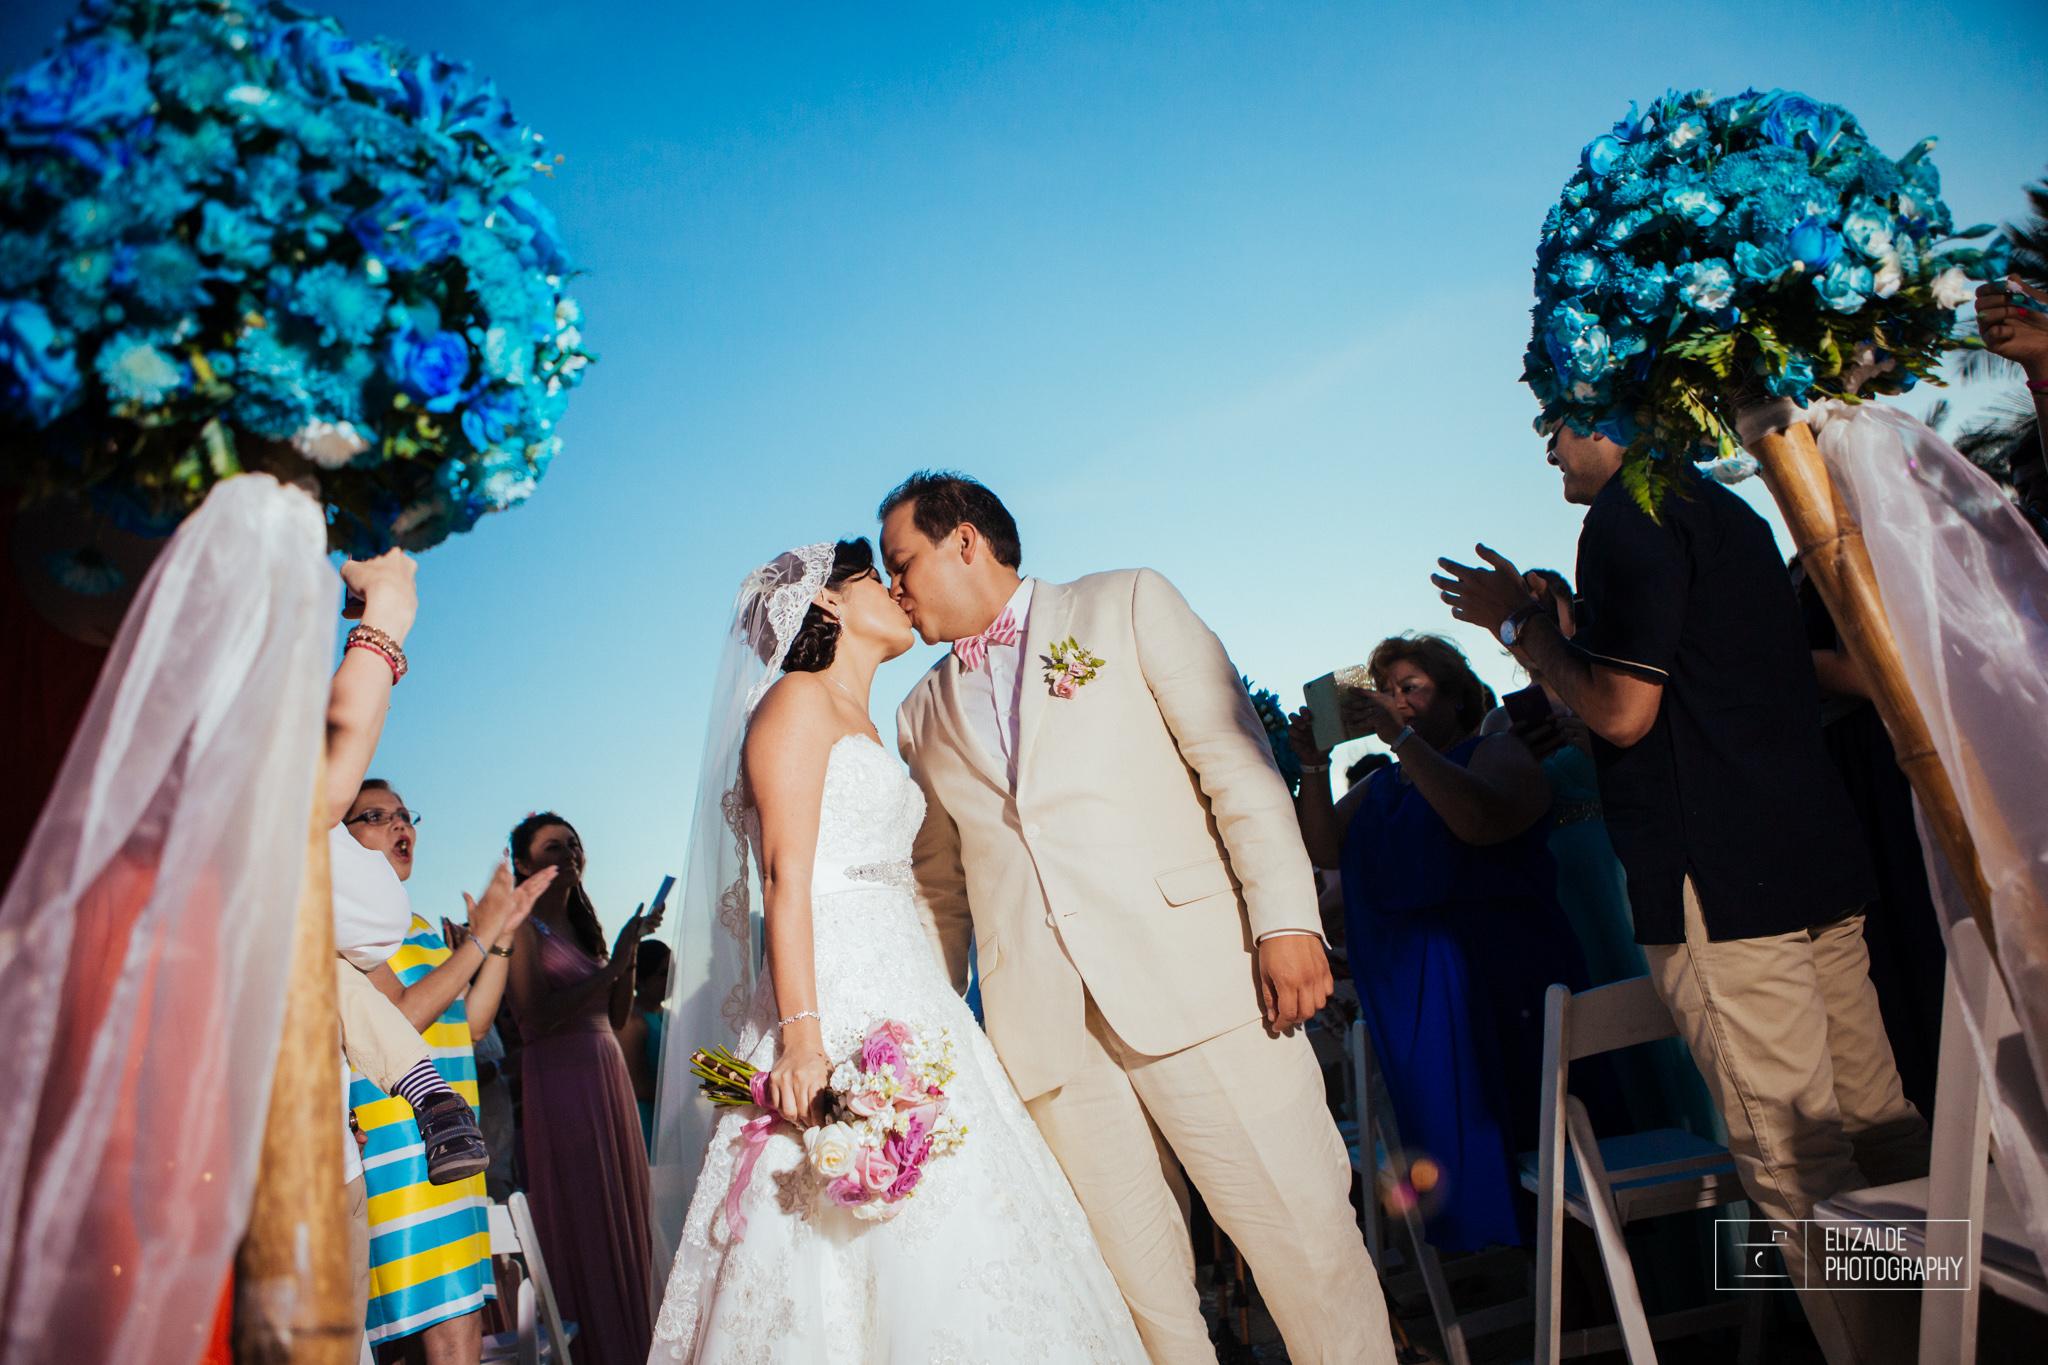 Pay and Ferran_Acapulco_Destination Wedding_Elizalde Photography-105.jpg